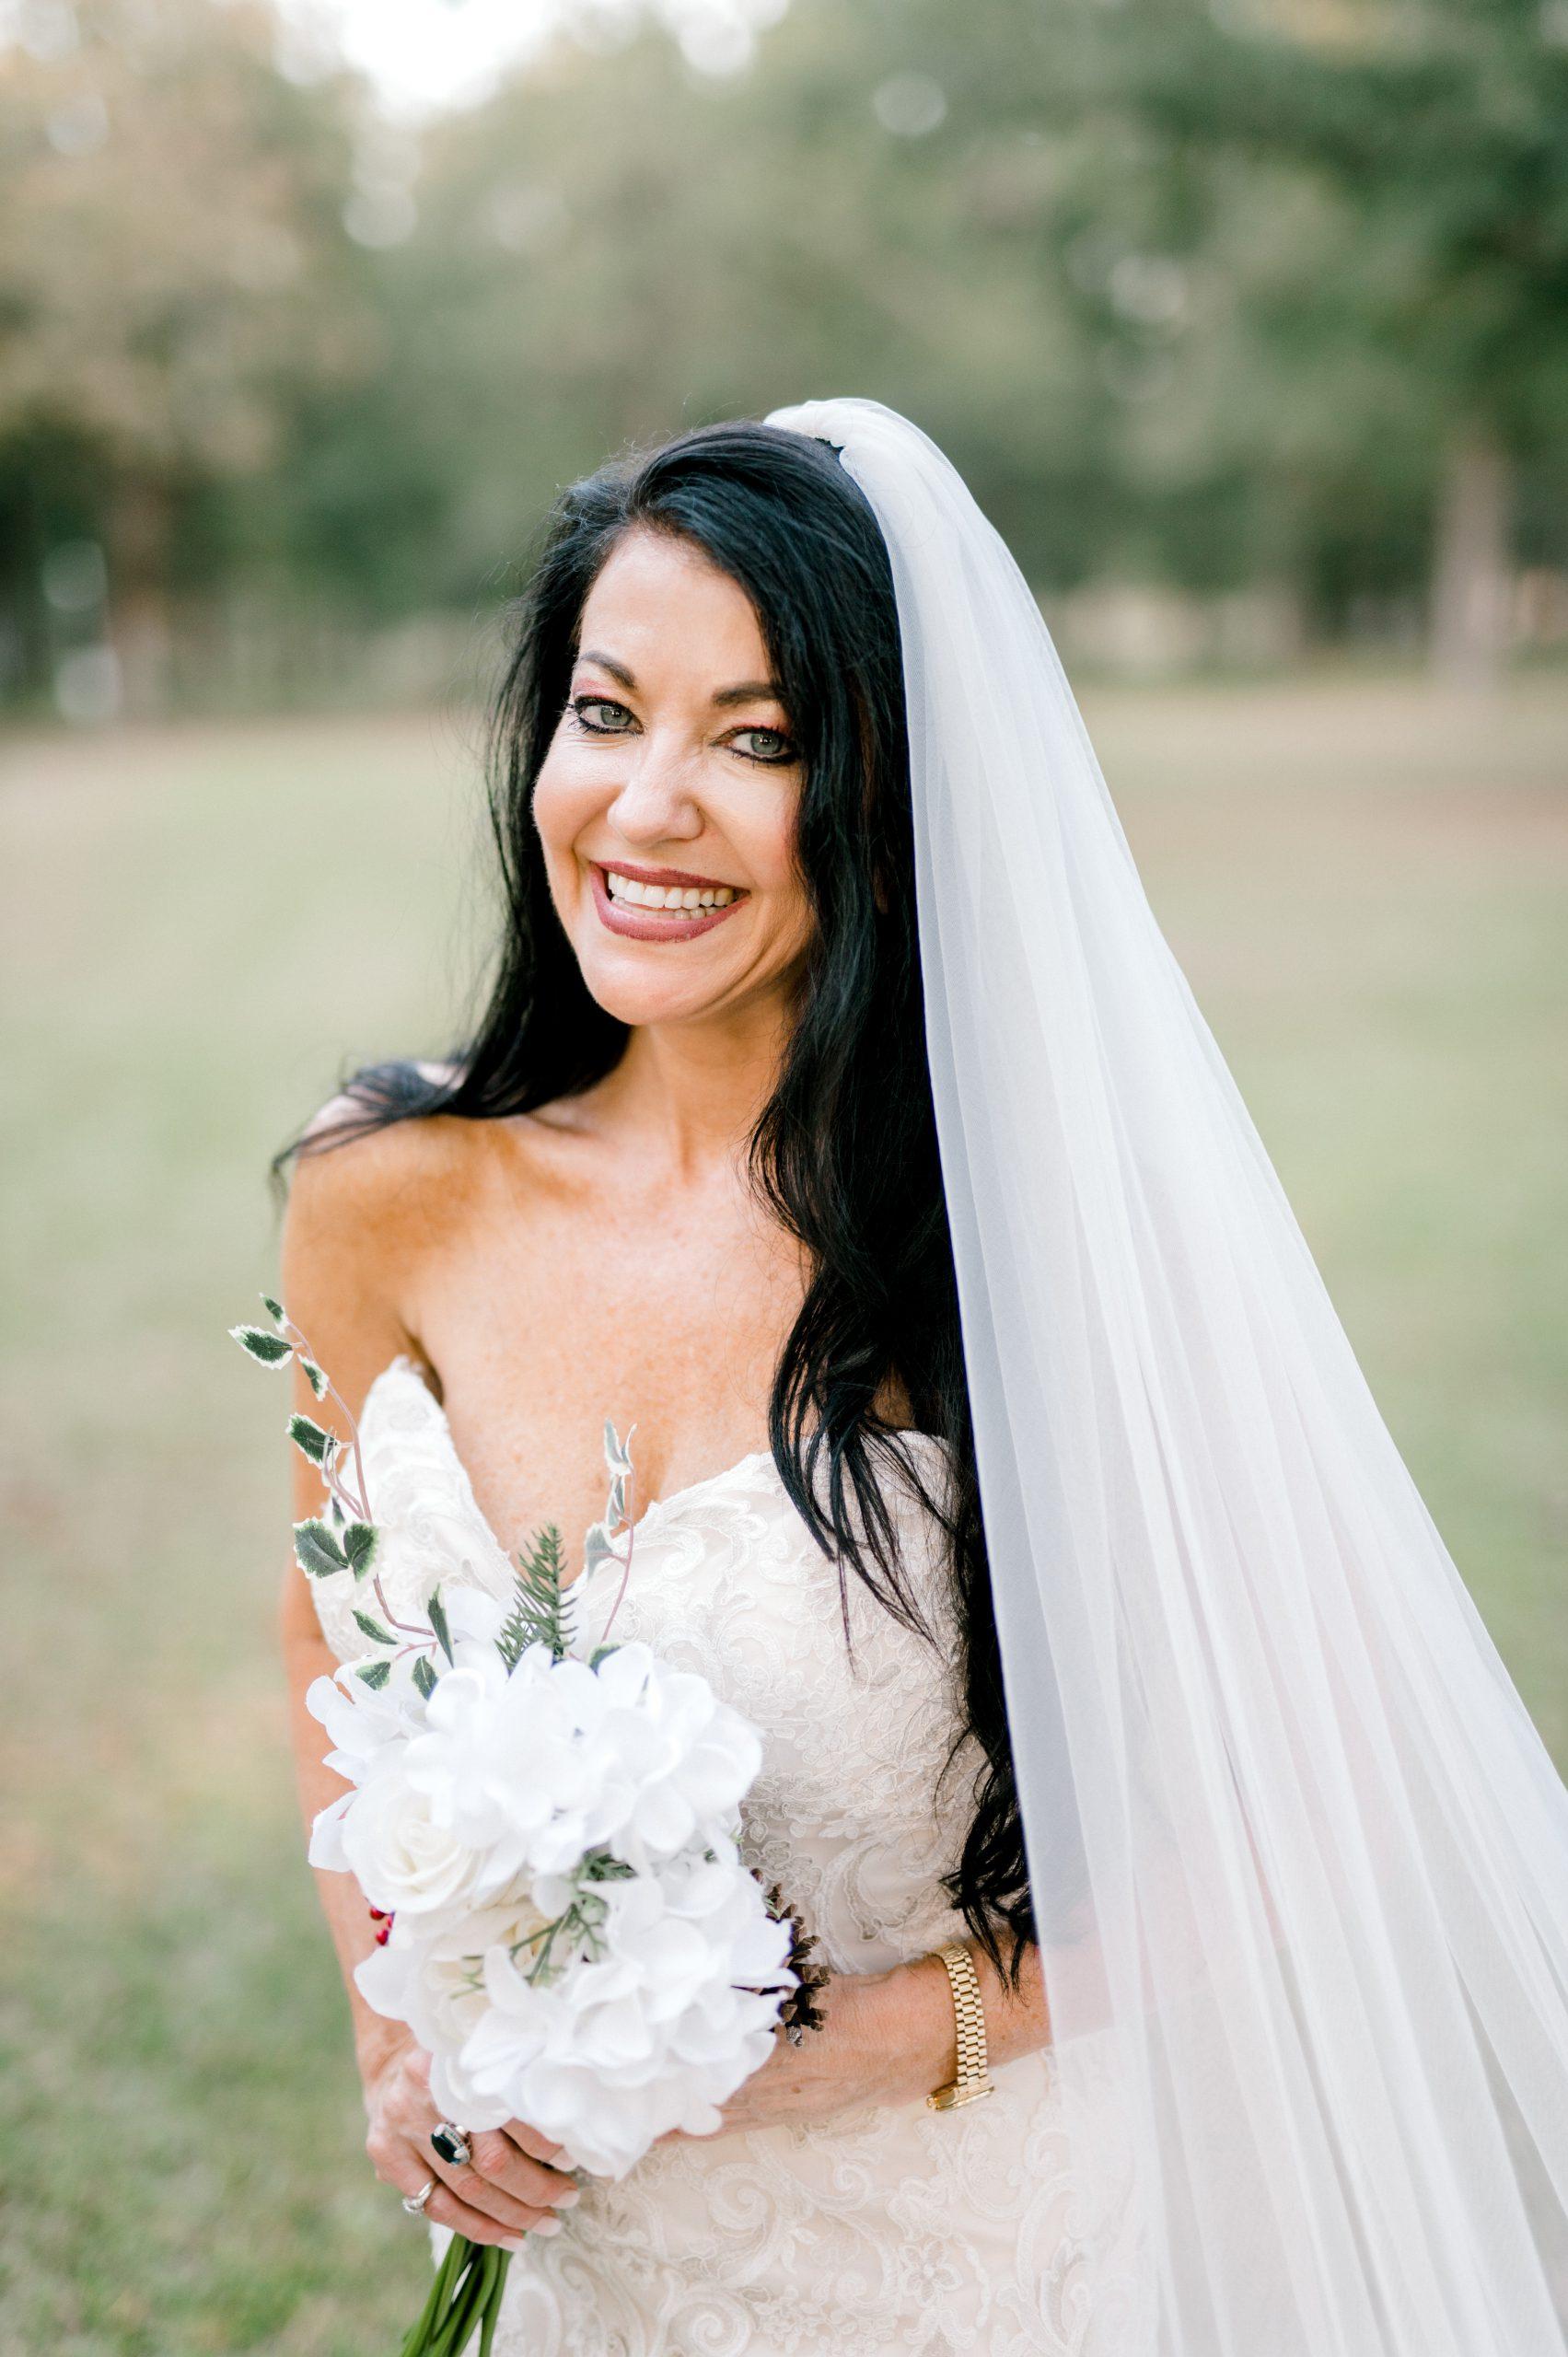 About Tricia's Bridal Boutique